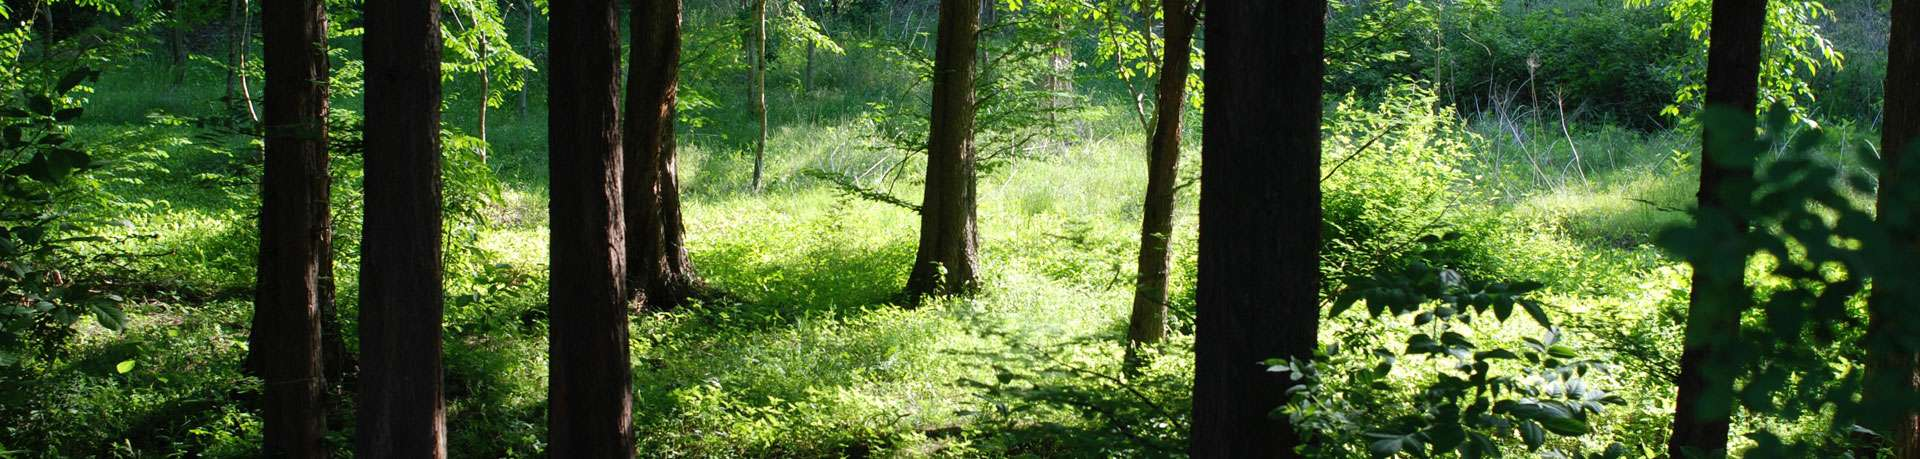 muskoka-forest-maintenance.min_